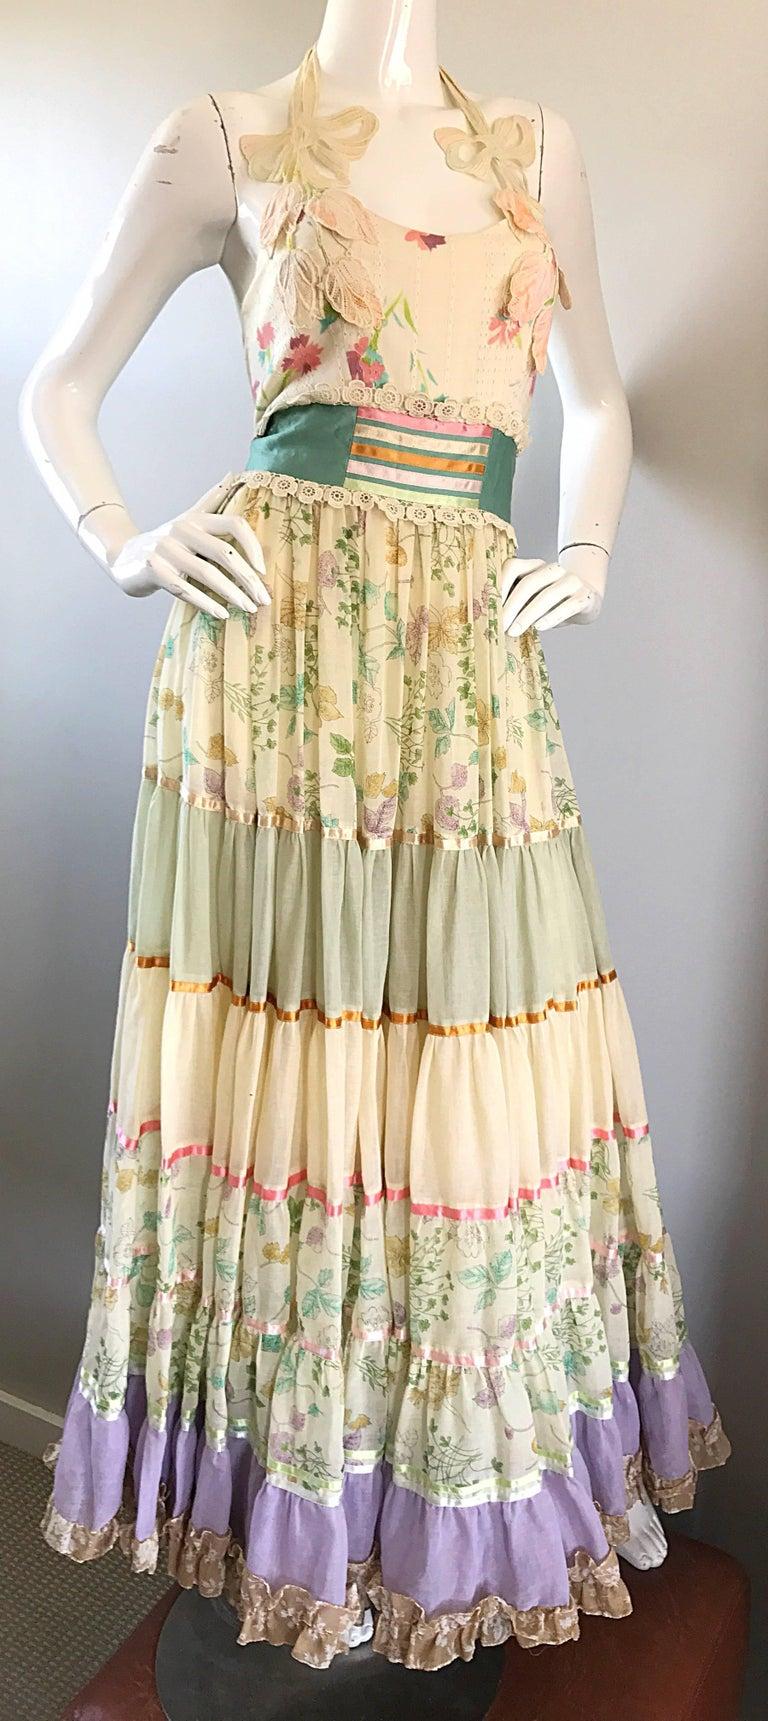 Giorgio di Sant Angelo Colorful Cotton Voile 70s Couture Maxi Dress Gown  For Sale 2